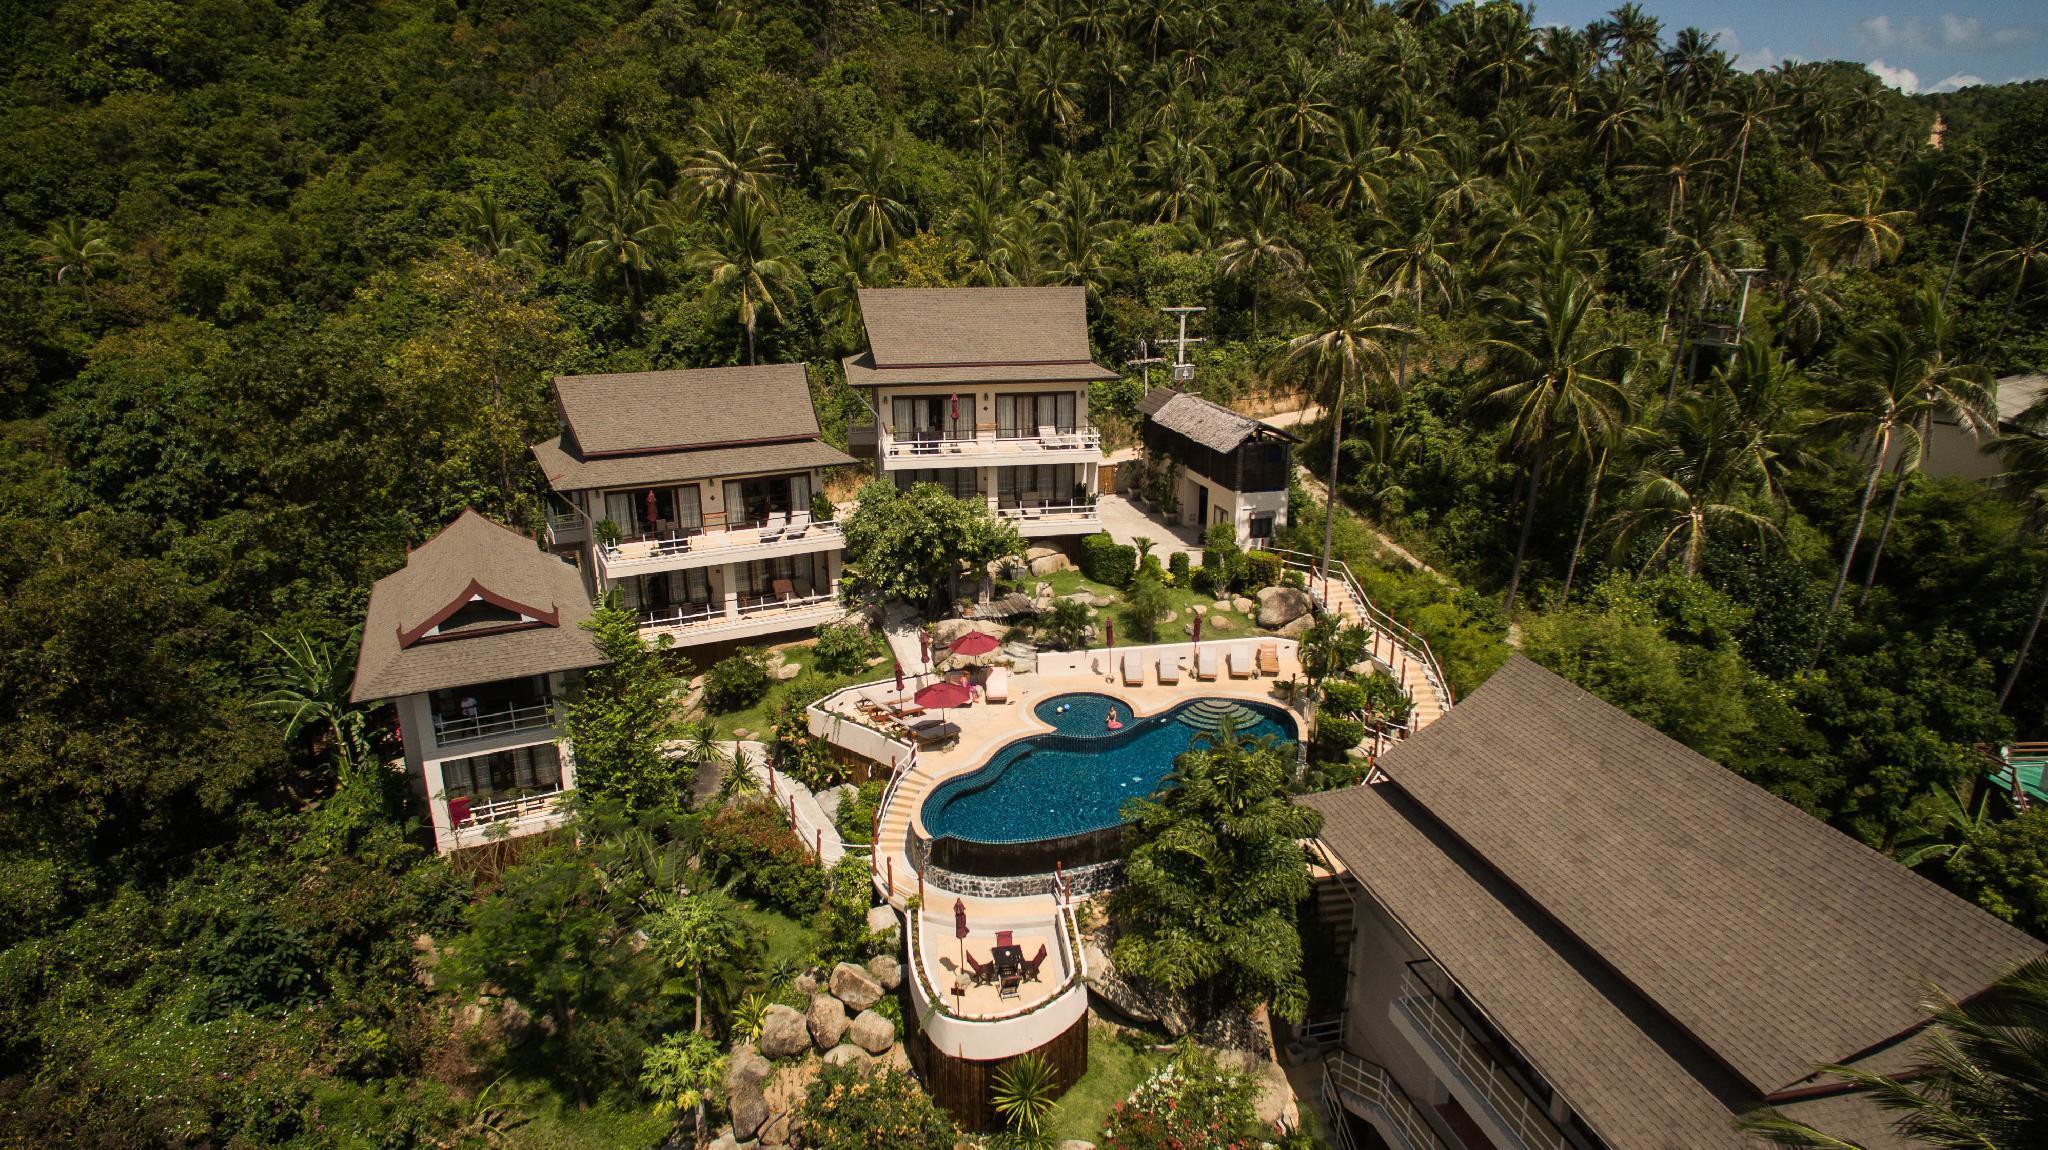 Koh Phangan Pavilions เกาะ พะงัน พาวีเลียน